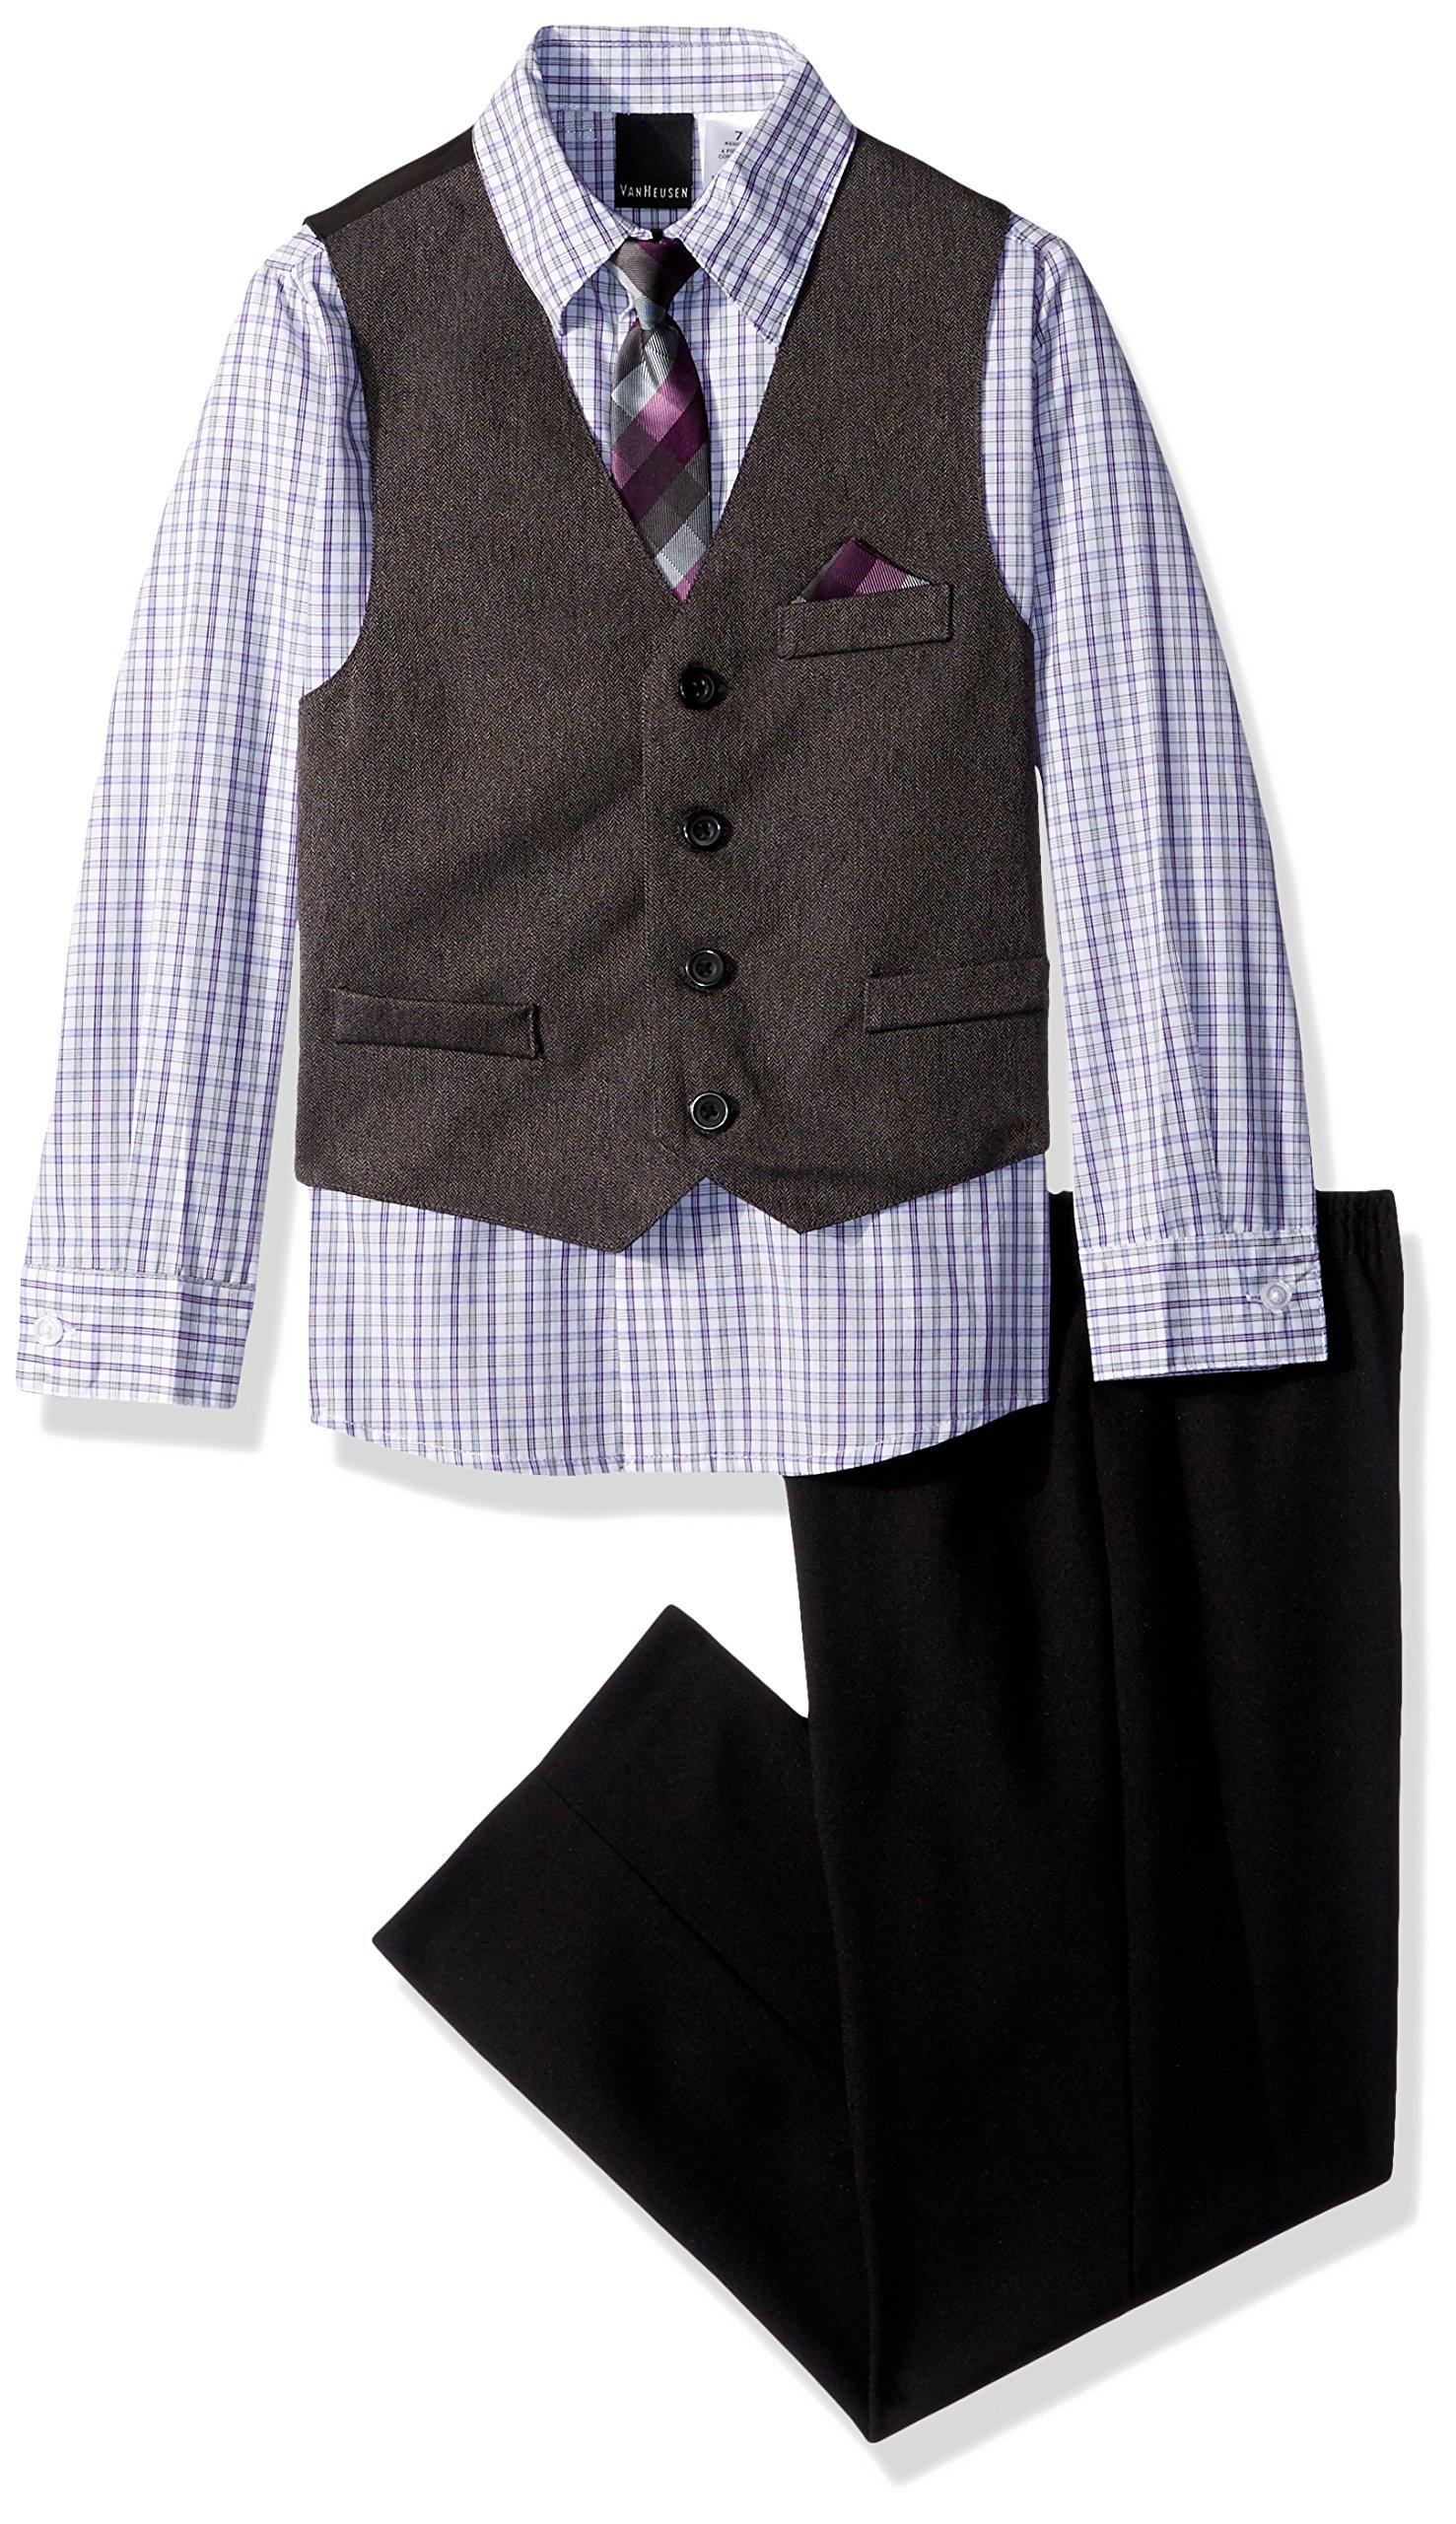 Van Heusen Boys' Four Piece Vest Dresswear Set with Tie, Grapesoda, 6